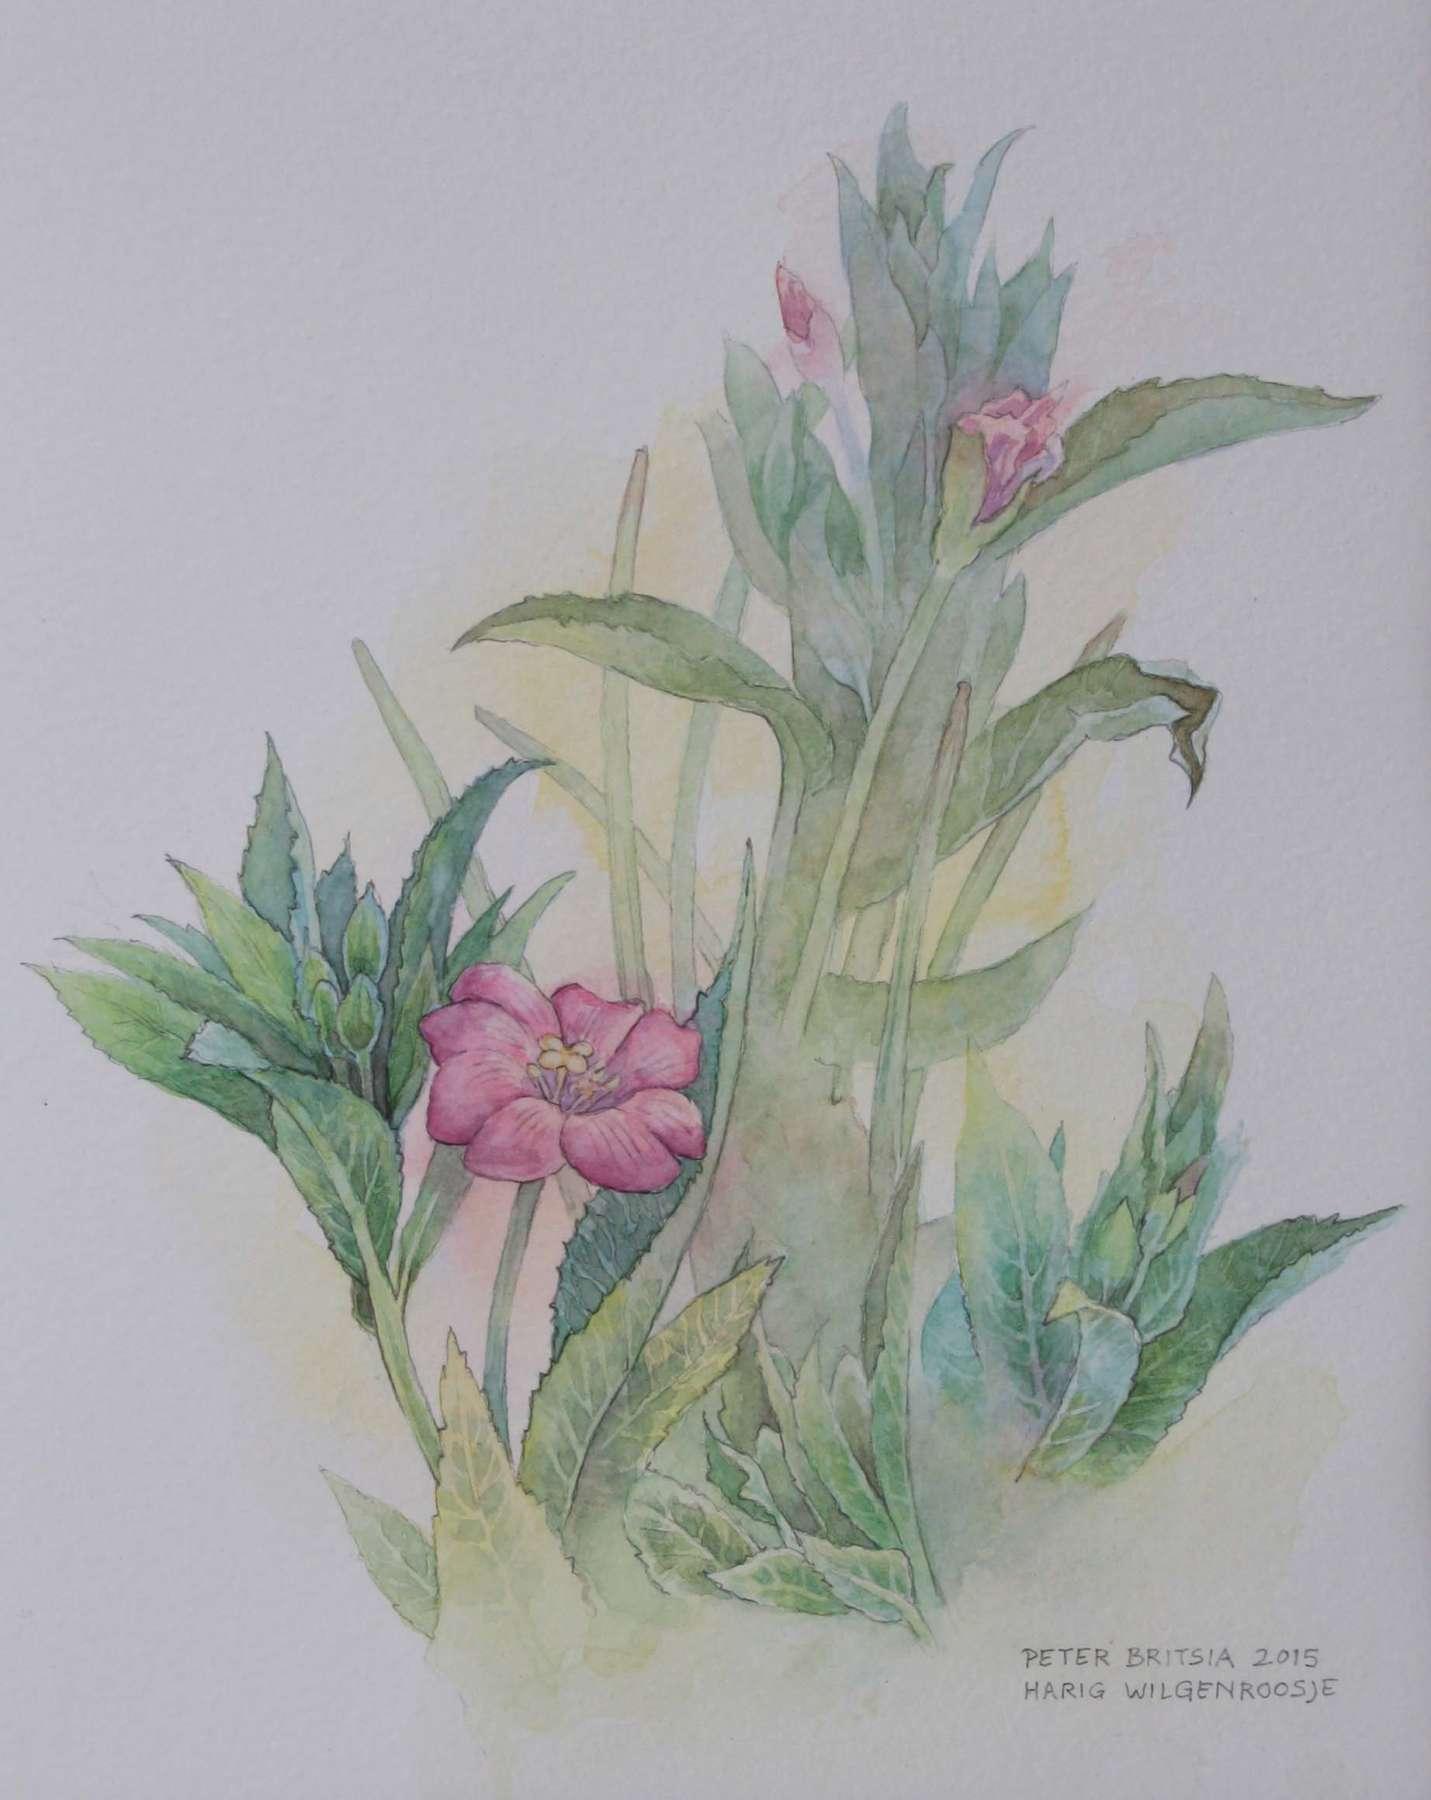 Harig wilgenroosje - aquarel - 18 x 23 cm.